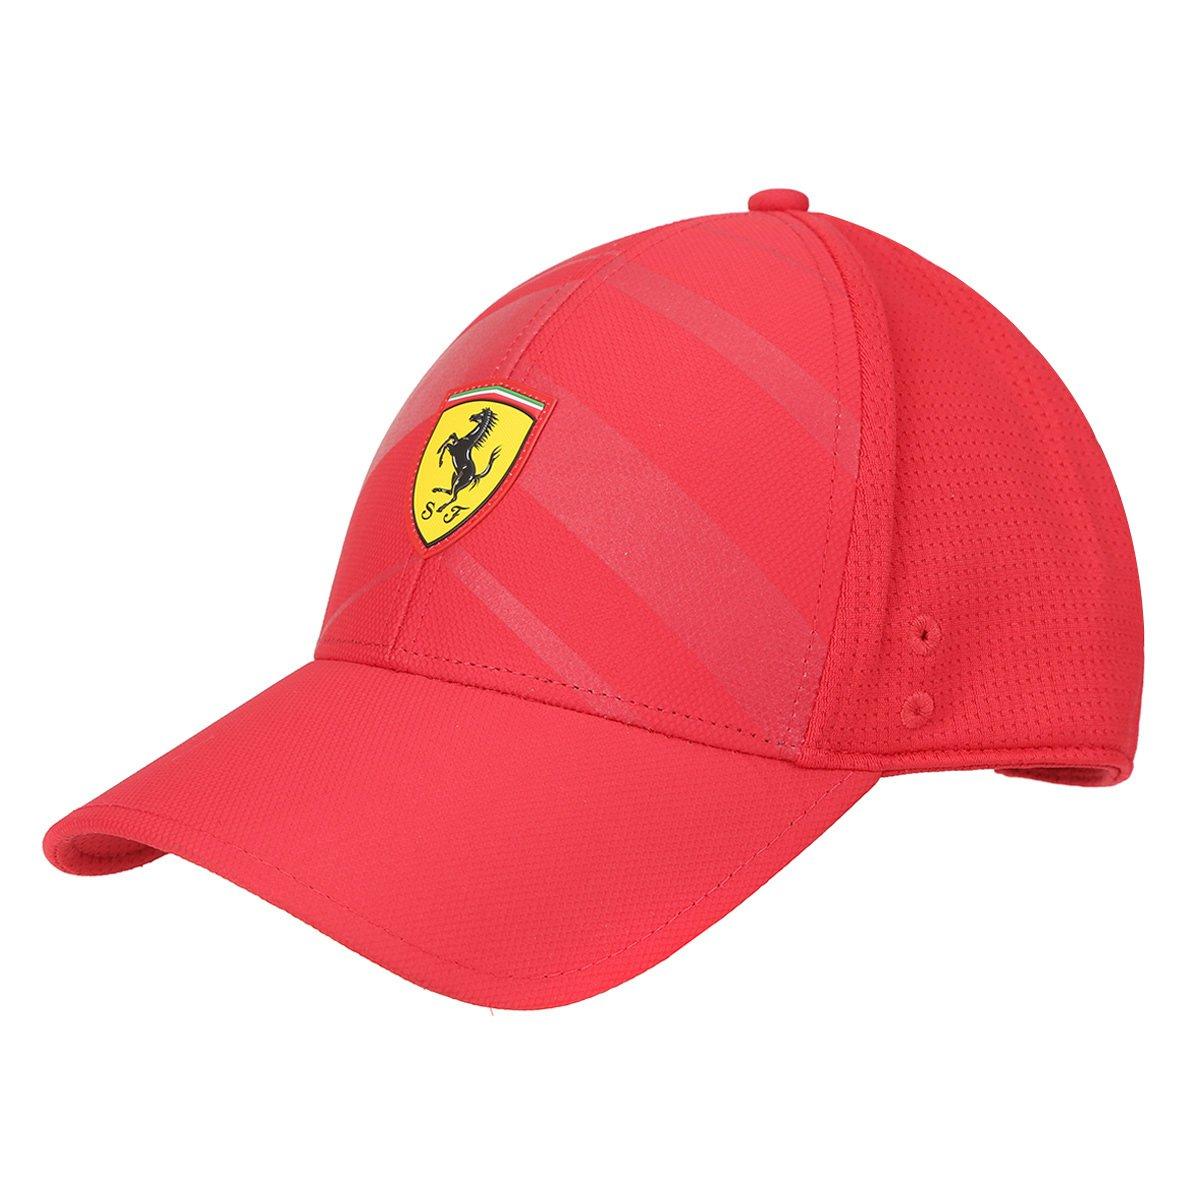 4a20aa93c Boné Puma Scuderia Ferrari Aba Curva Fanwear Tech BB - Vermelho | Zattini